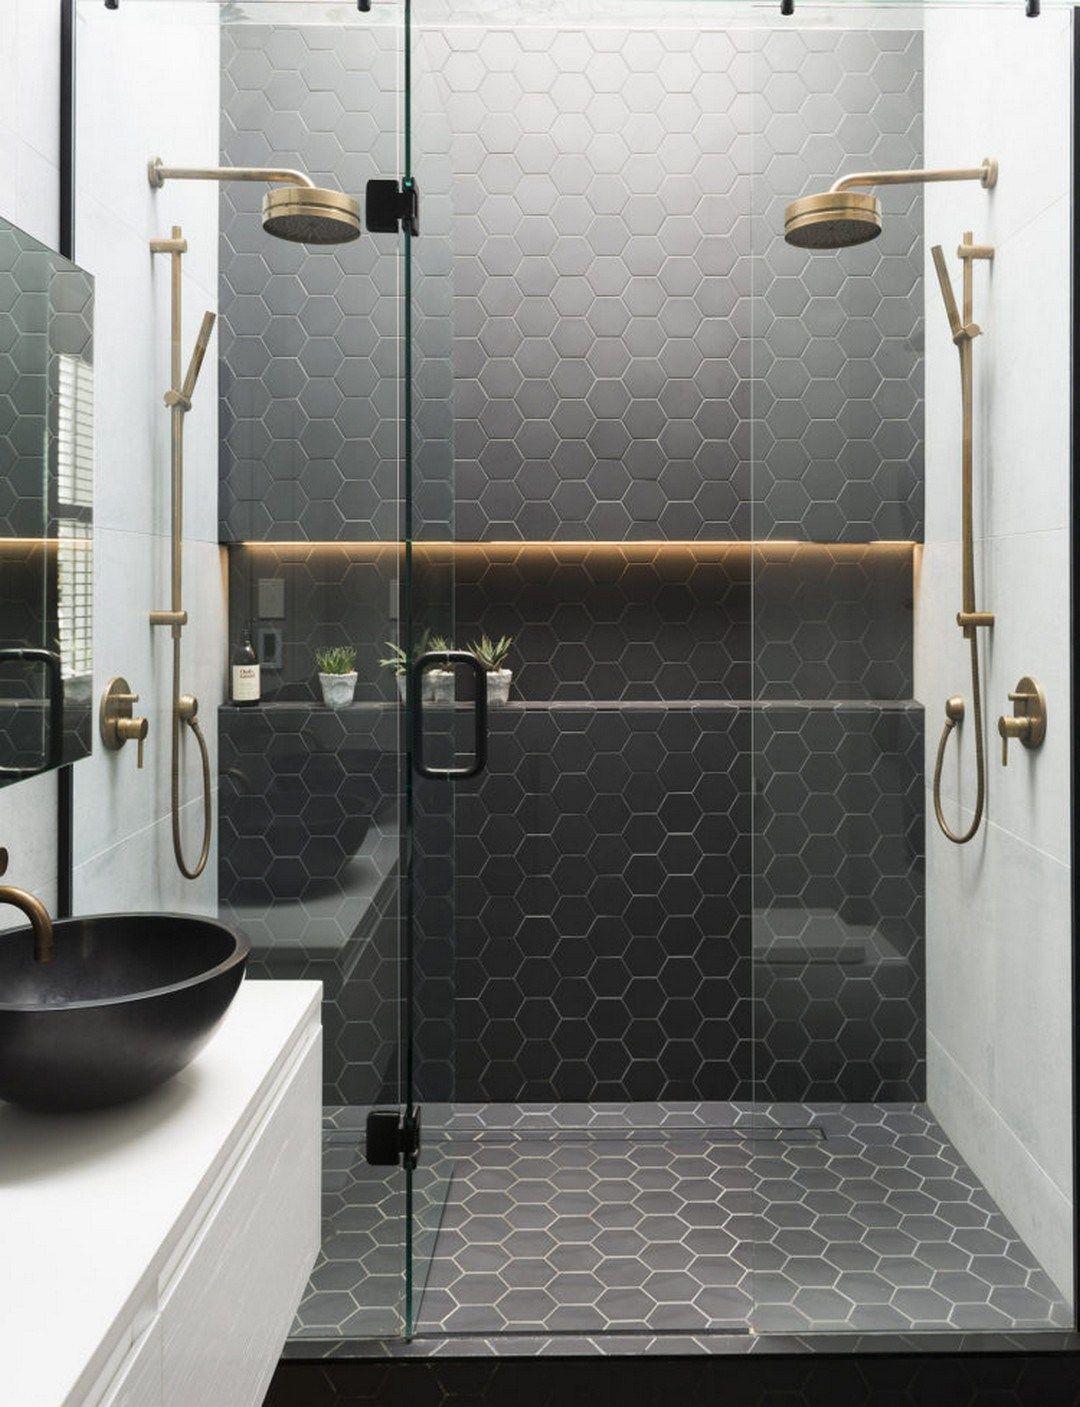 99 New Trends Bathroom Tile Design Inspiration 2017 14 99architecture Bathroom Design Bathroom Interior Design Bathroom Layout